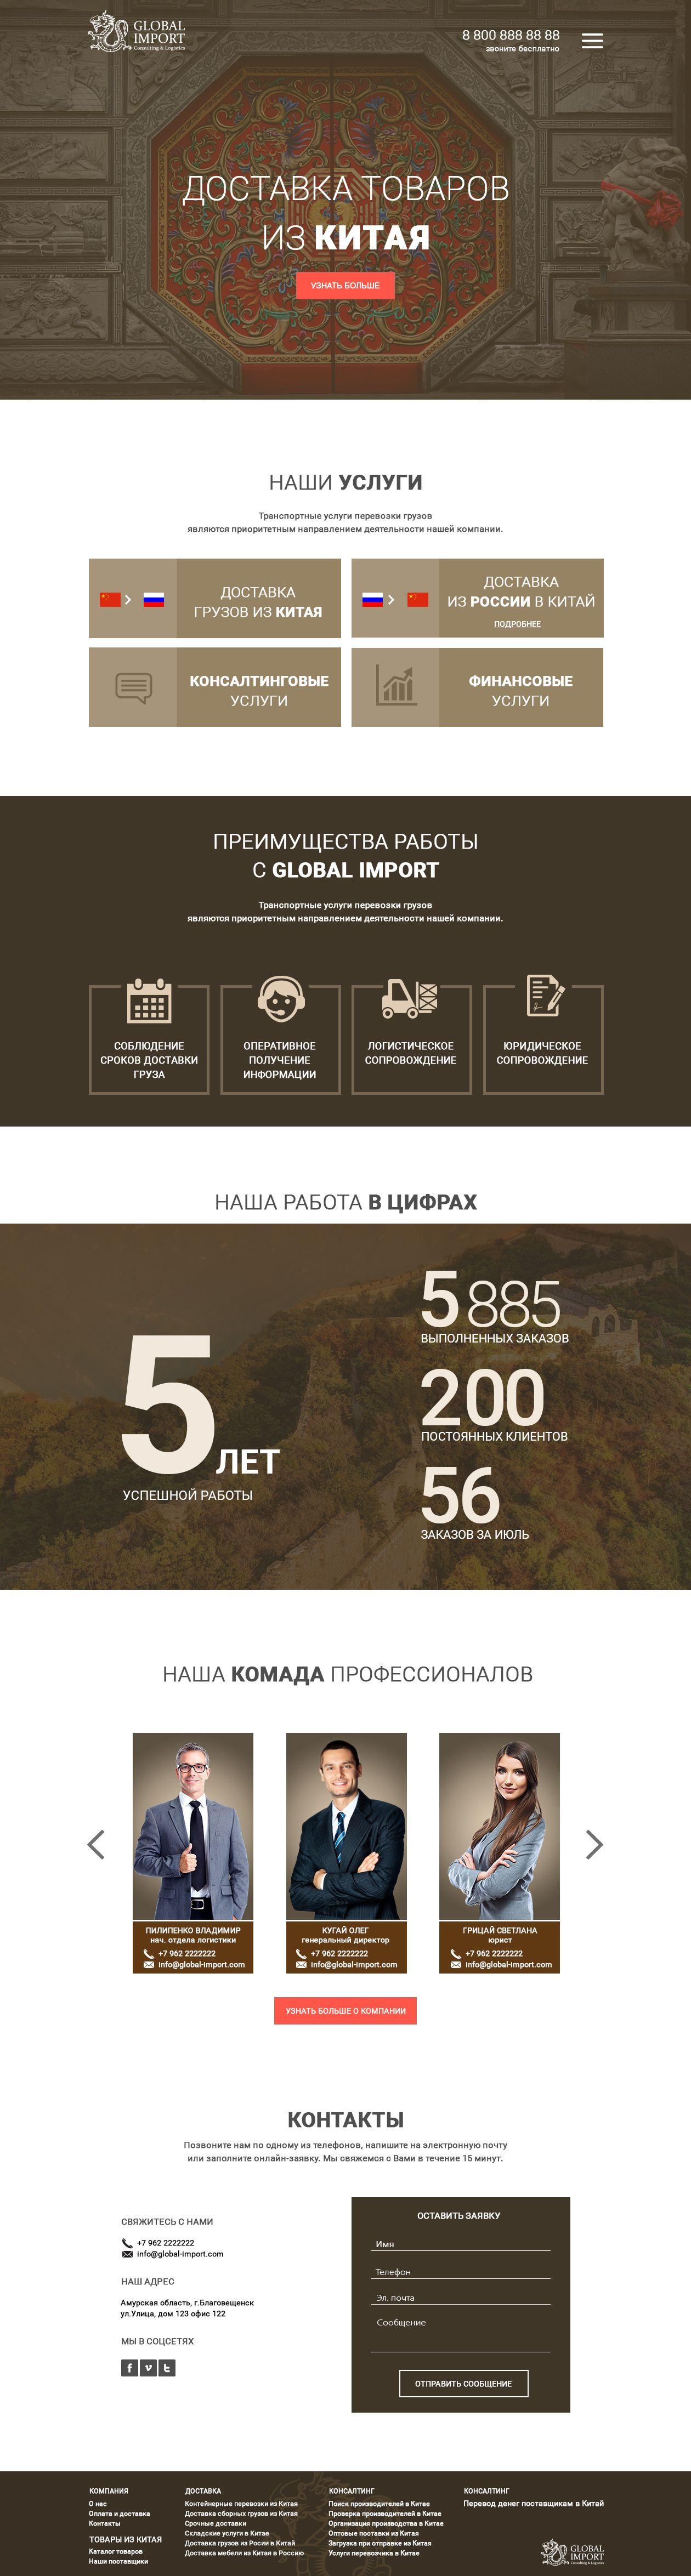 Веб-сайт для GI - дизайнер PetkusTolya